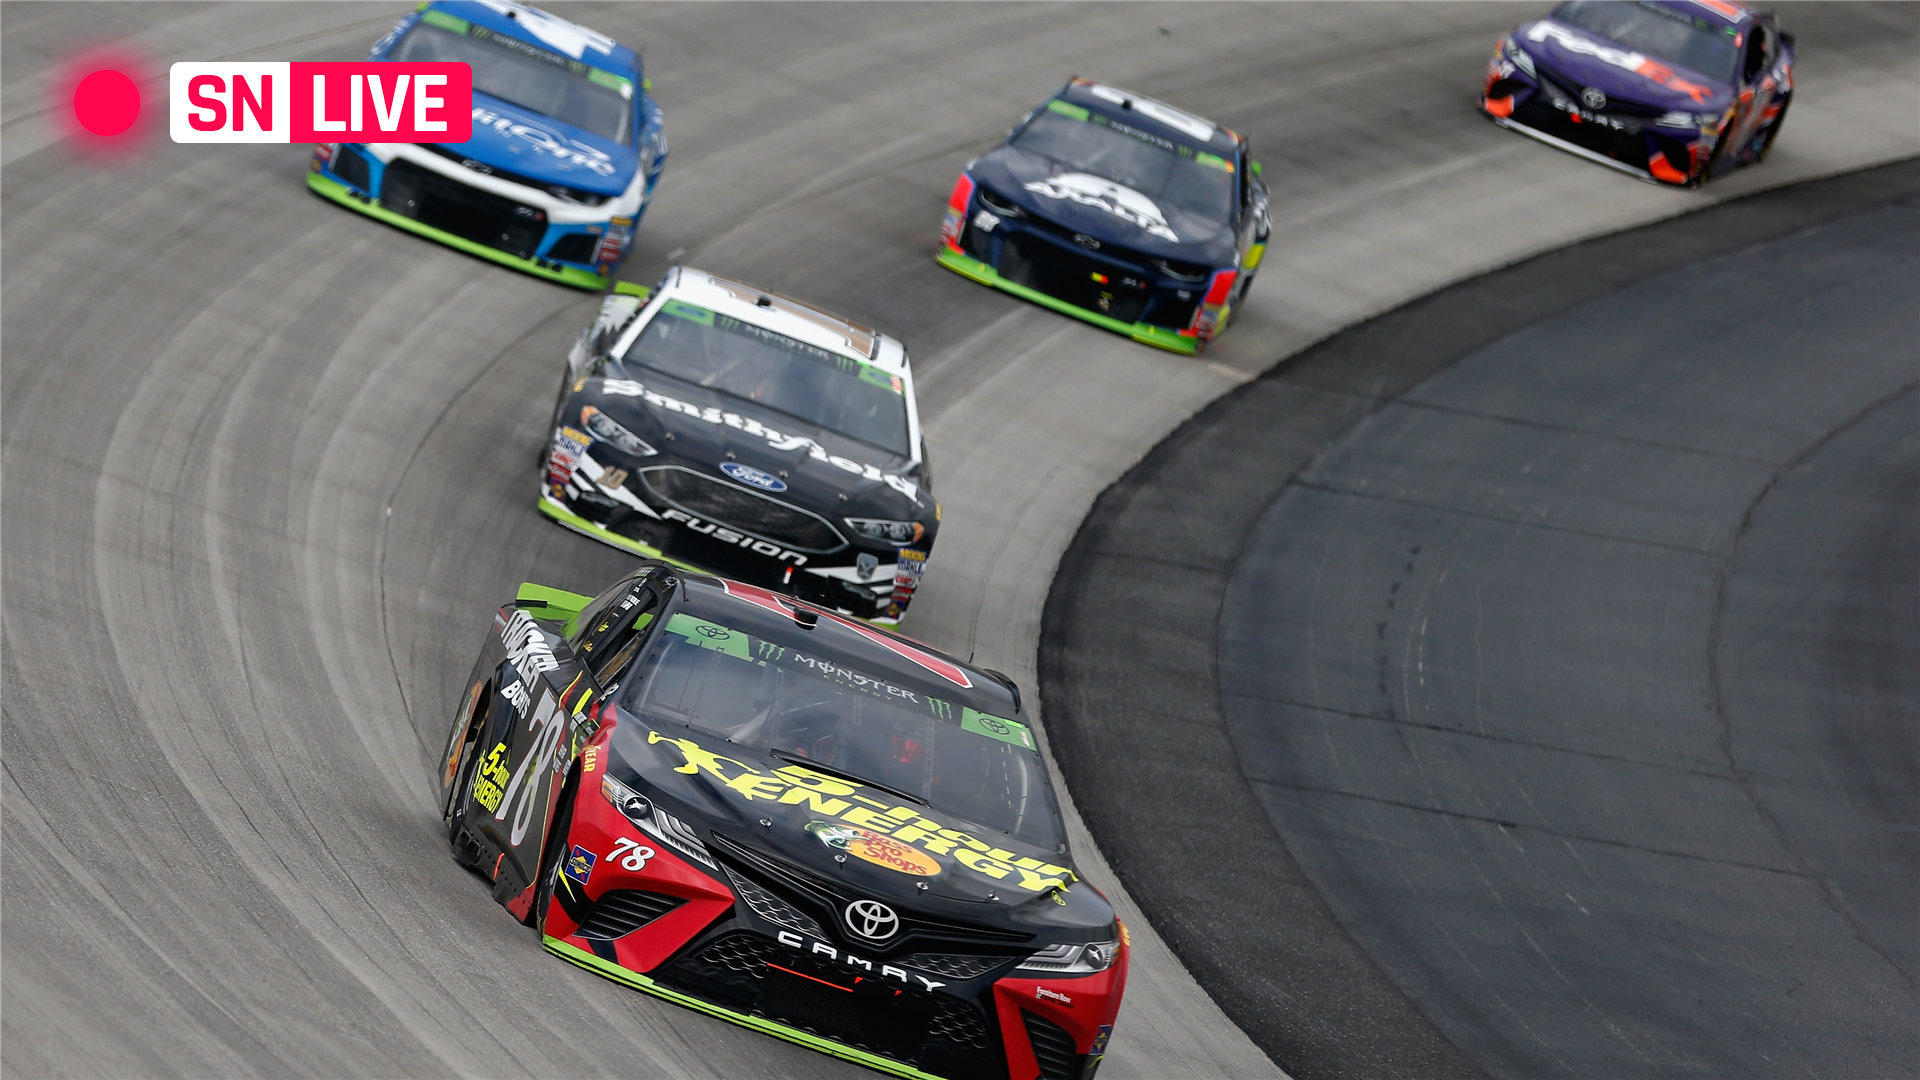 NASCAR at Kansas: Race result highlights from Chase Elliott's Hollywood Casino 400 win